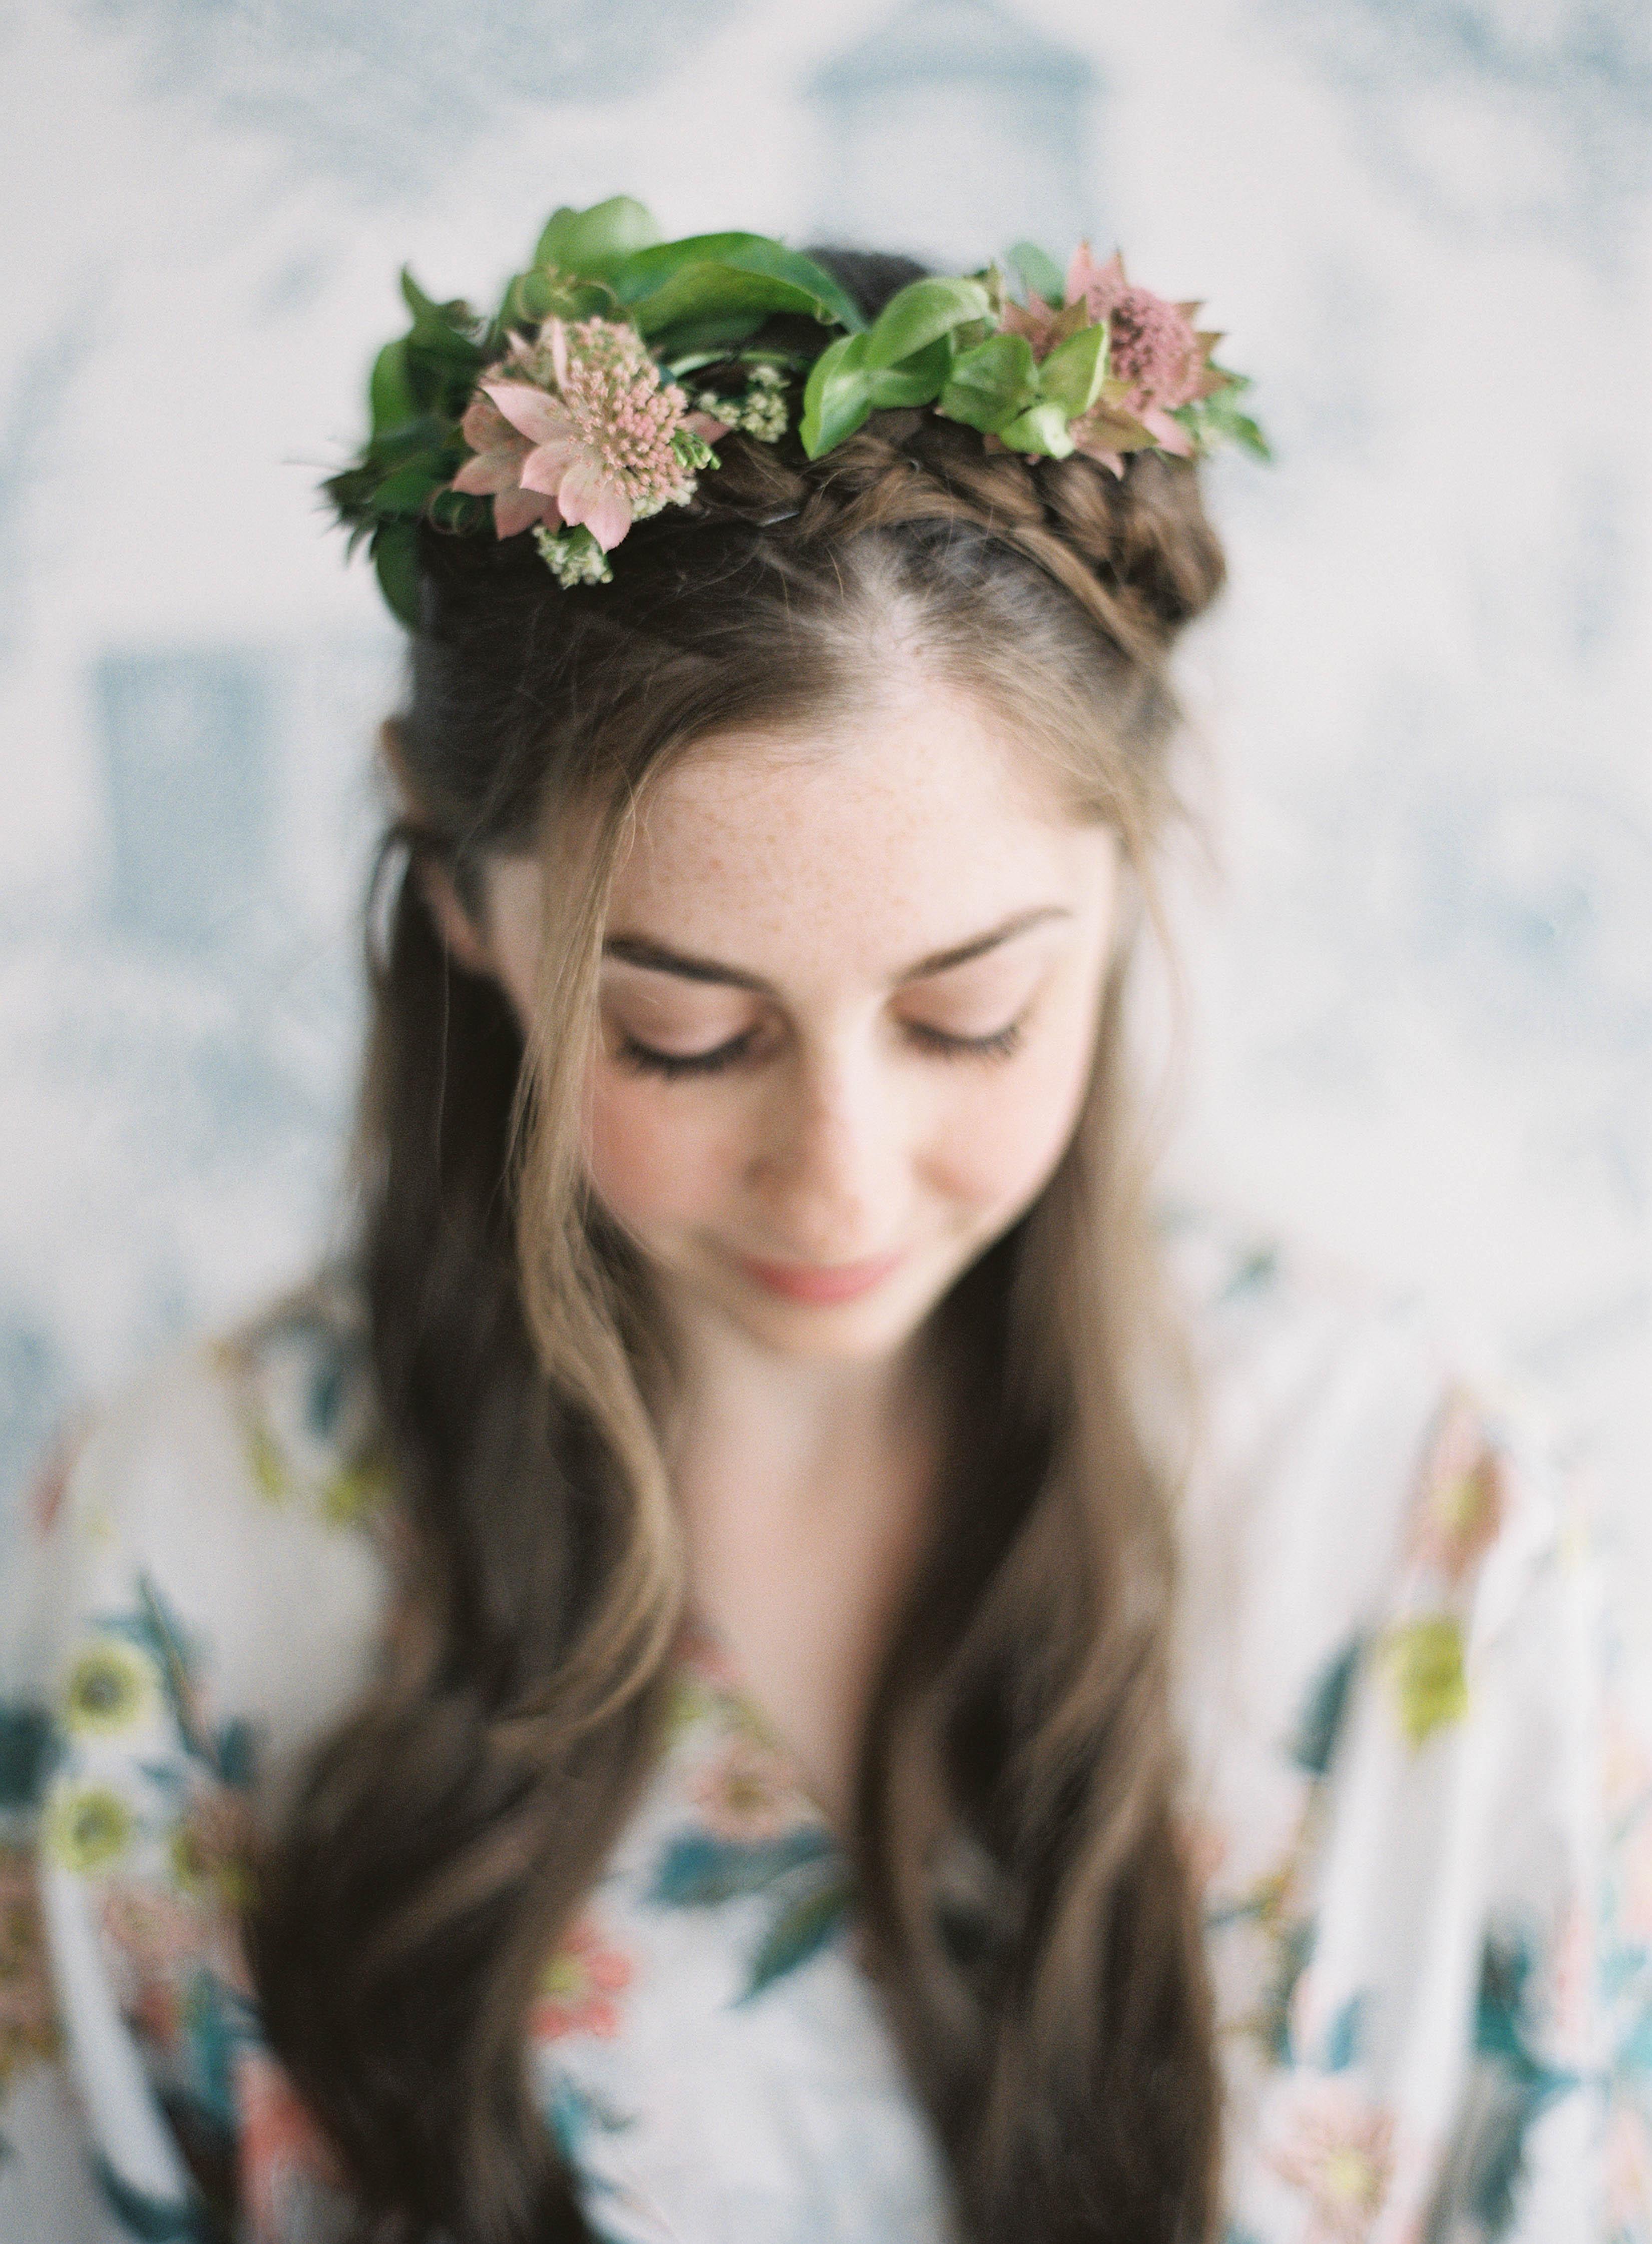 Flower crown for bride elizabeth anne designs the wedding blog flower crown for bride izmirmasajfo